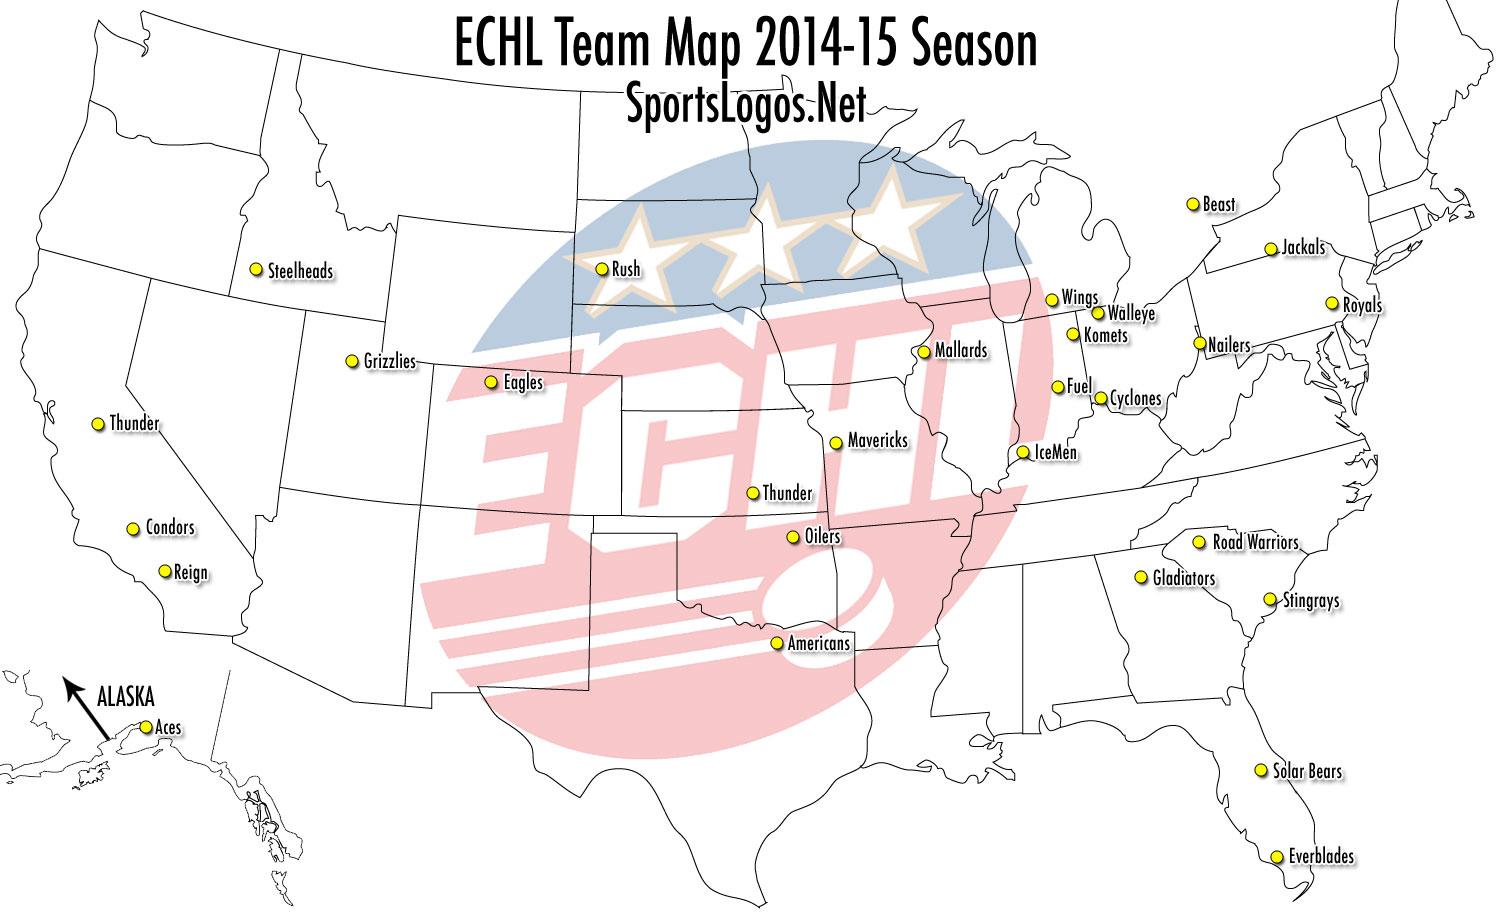 ECHL-Team-Map-2014-2015